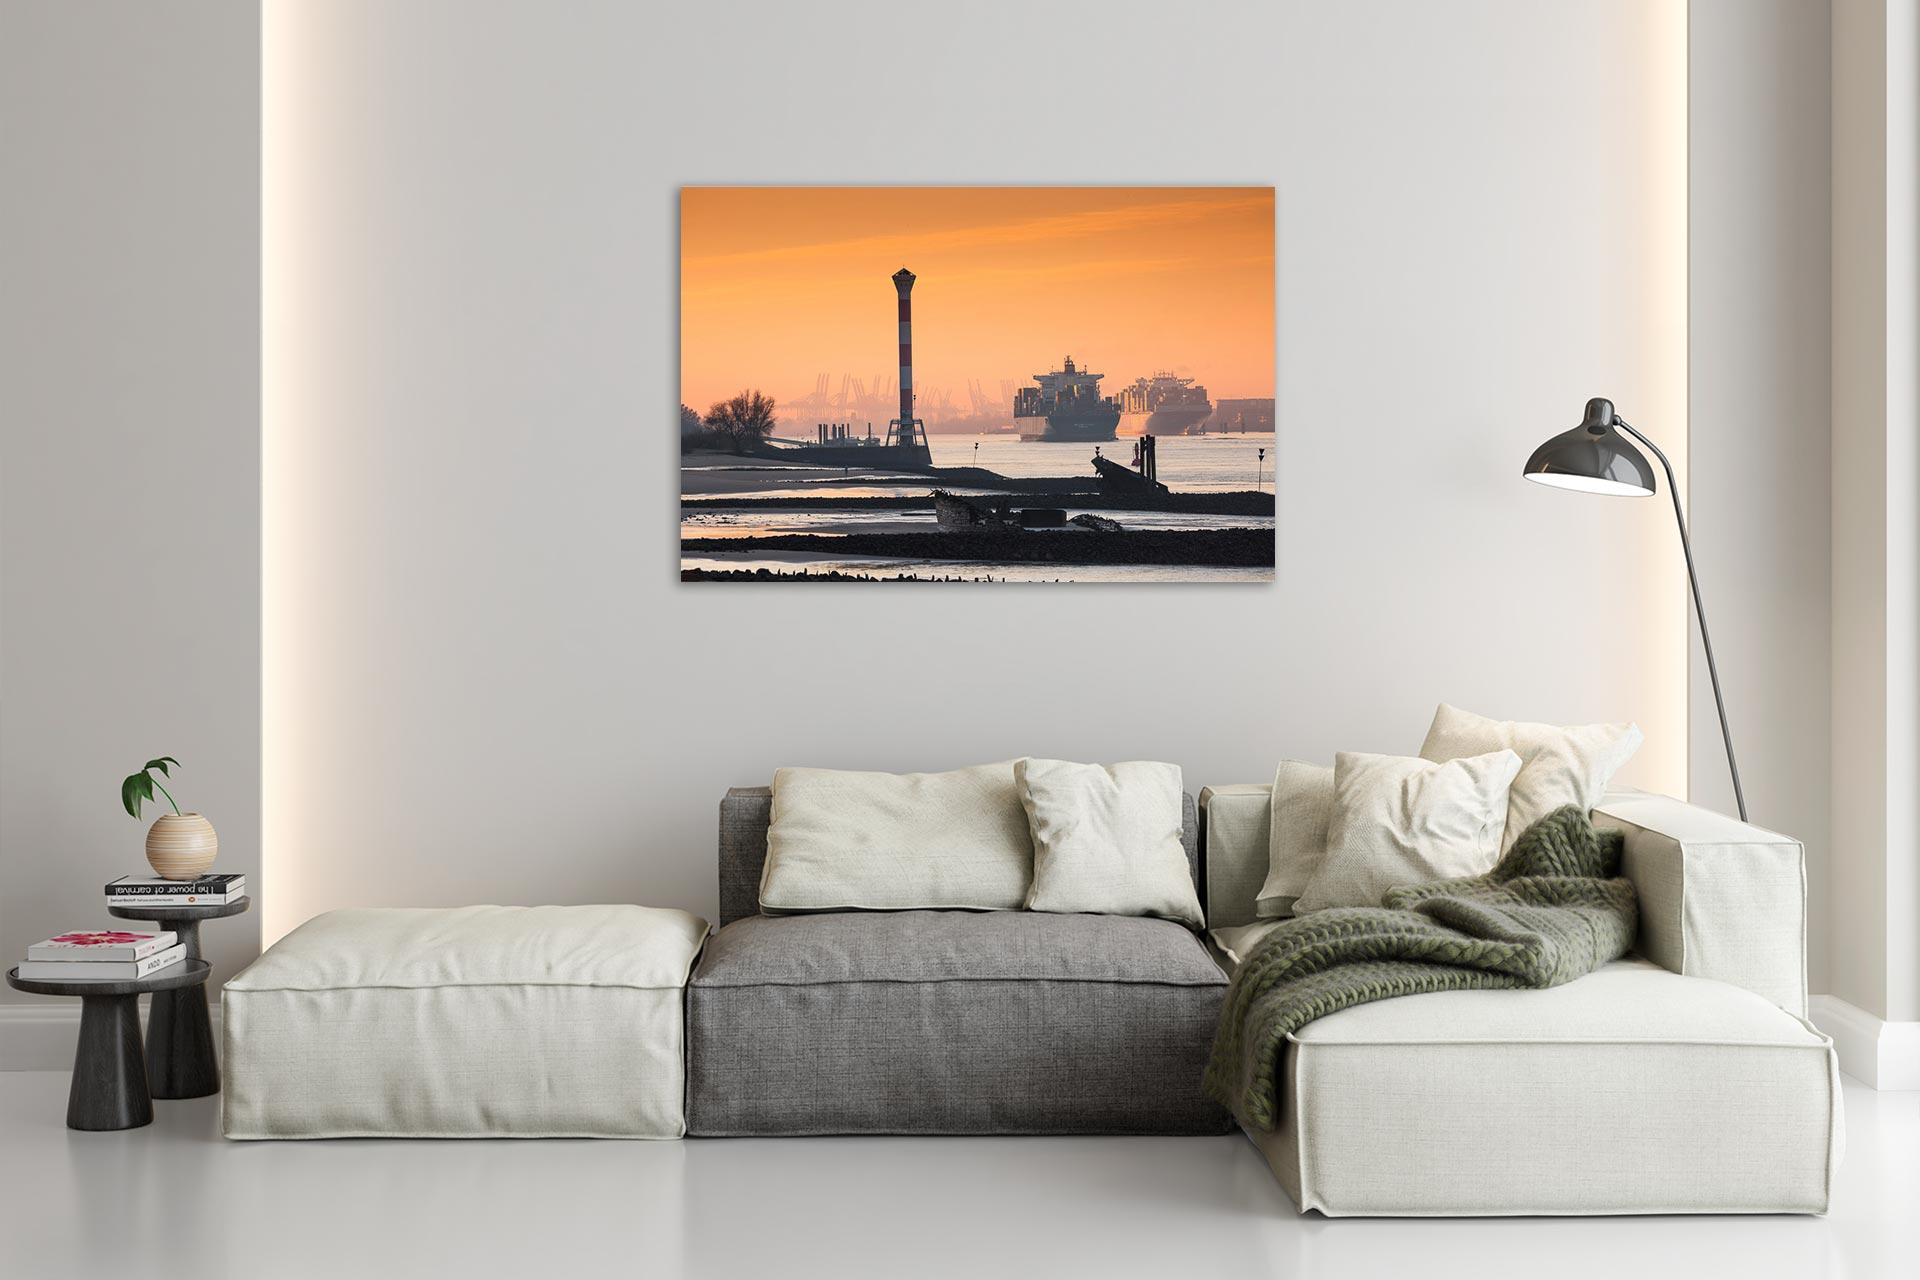 JS063-sonnenaufgang-wandbild-bild-auf-leinwand-acrylglas-aludibond-wohnzimmer